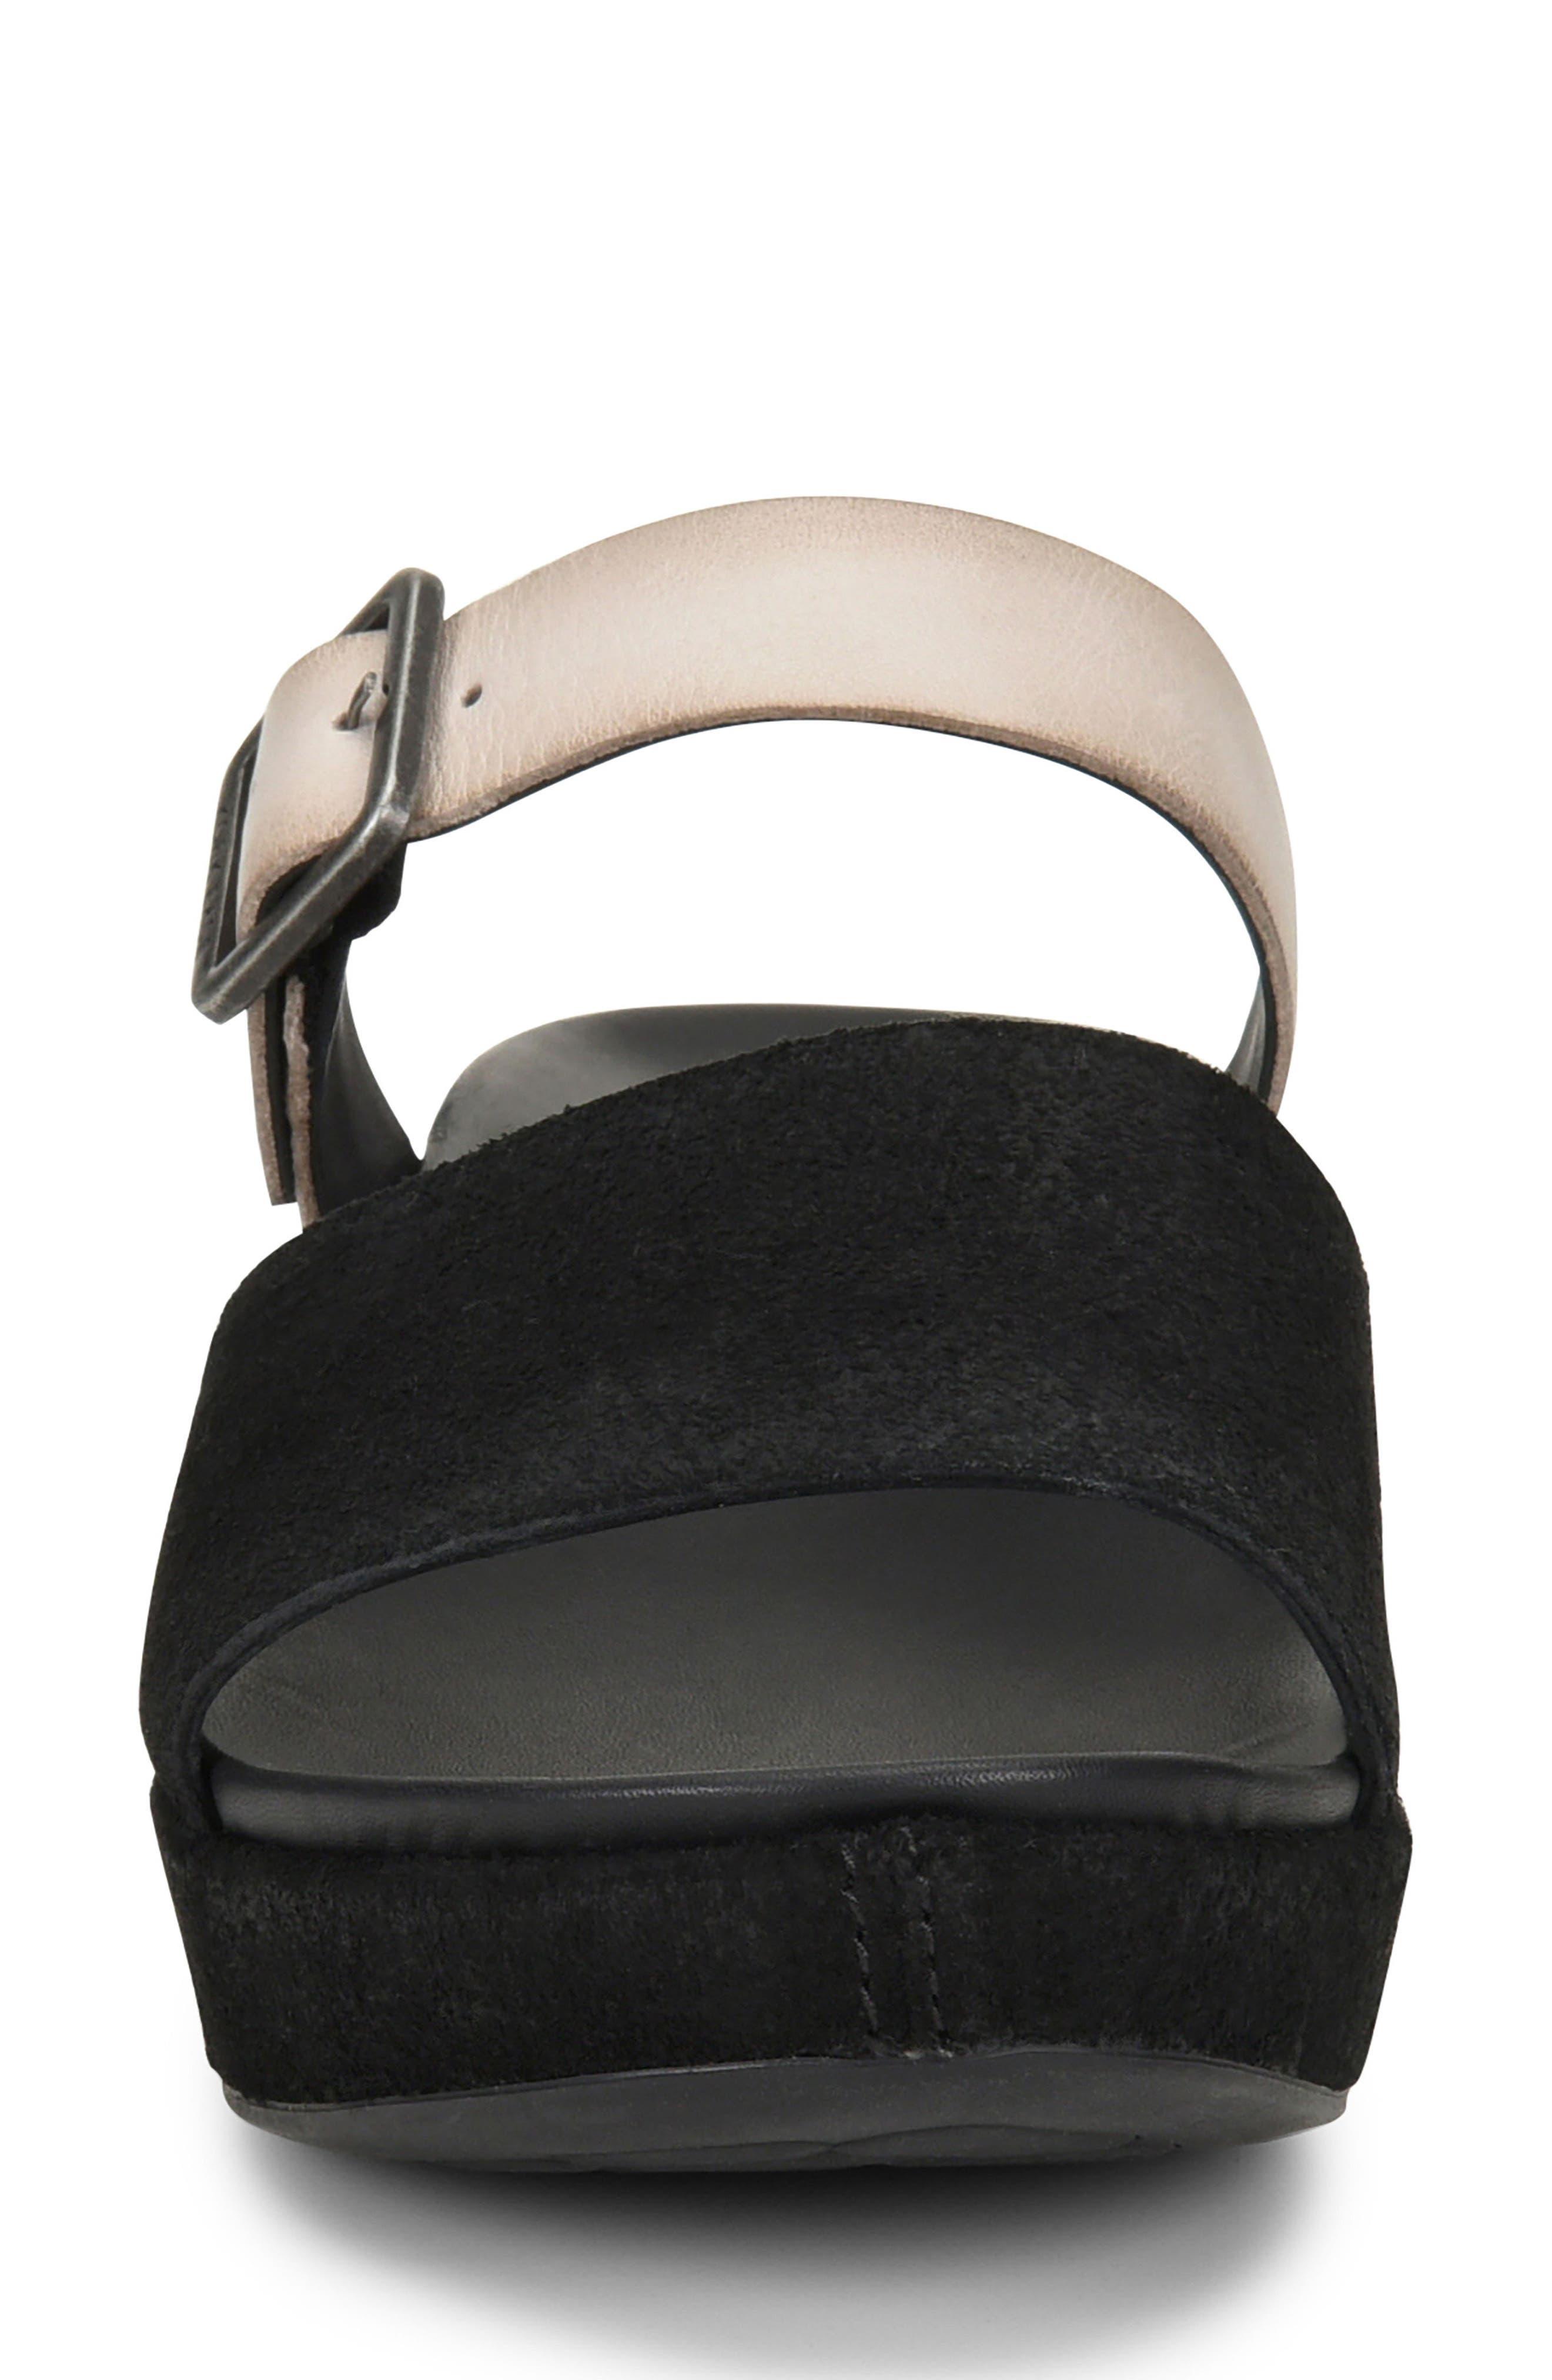 Bisti Wedge Slide Sandal,                             Main thumbnail 1, color,                             BLACK/ GREY LEATHER